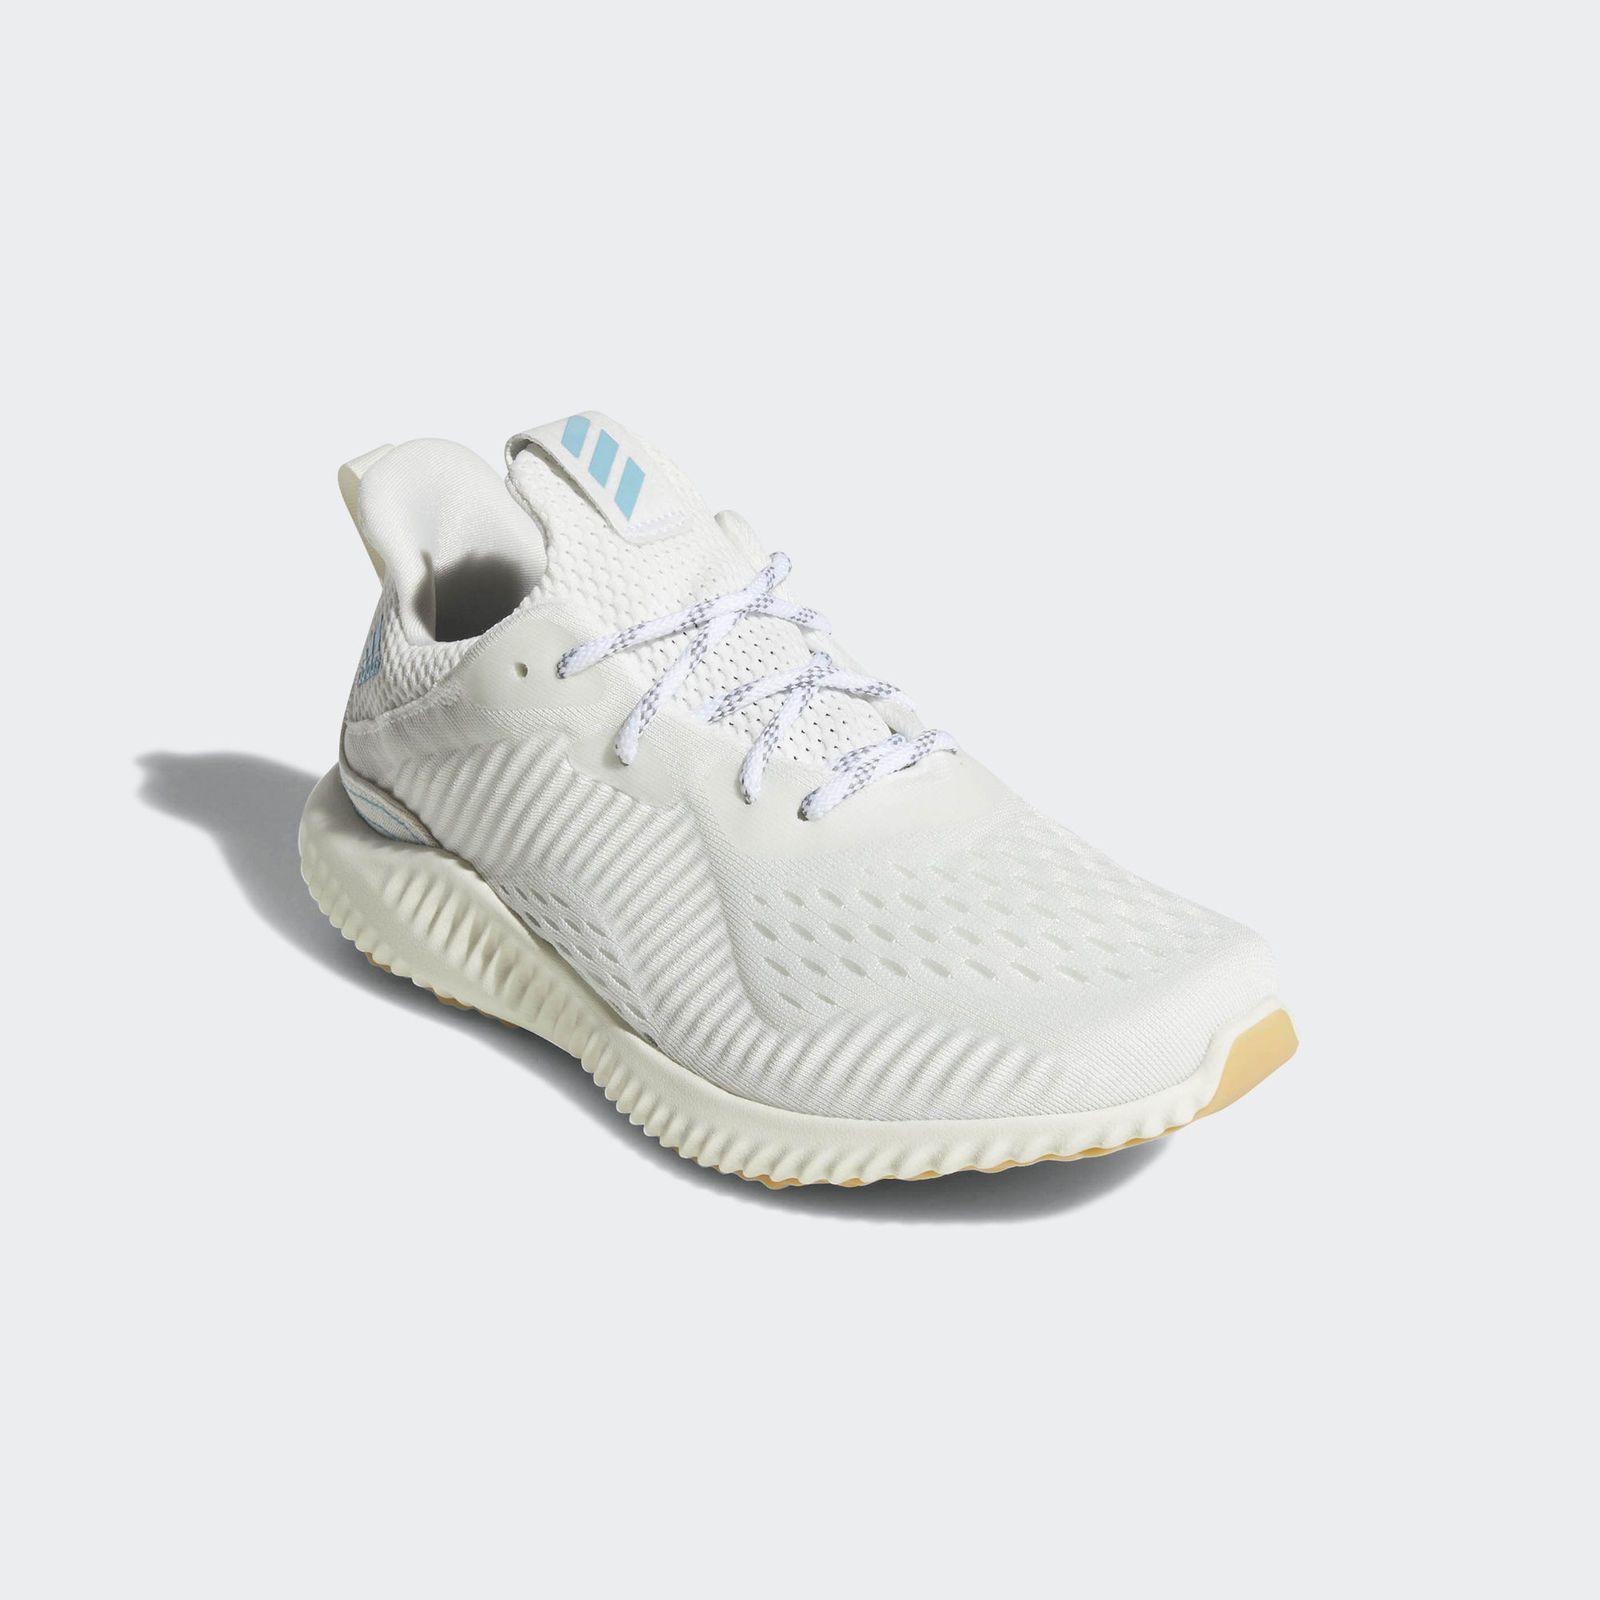 f9d4d254135 adidas Alphabounce 1 Parley Shoes Women s  54.99 End Date  2018-12-23 04